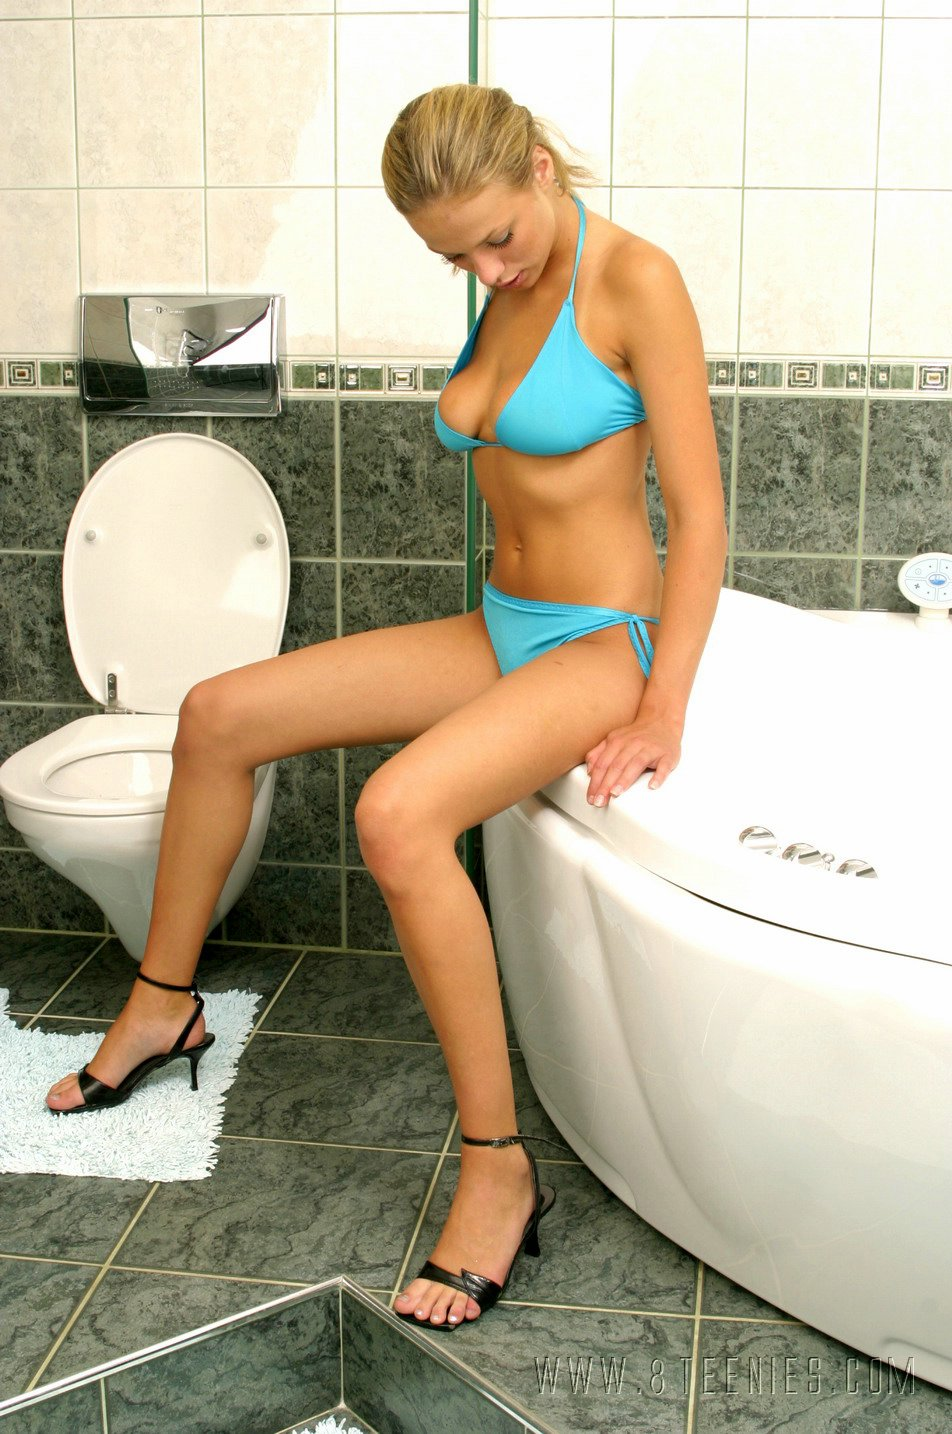 bridget-bikini-bath-nude-8teenies-01